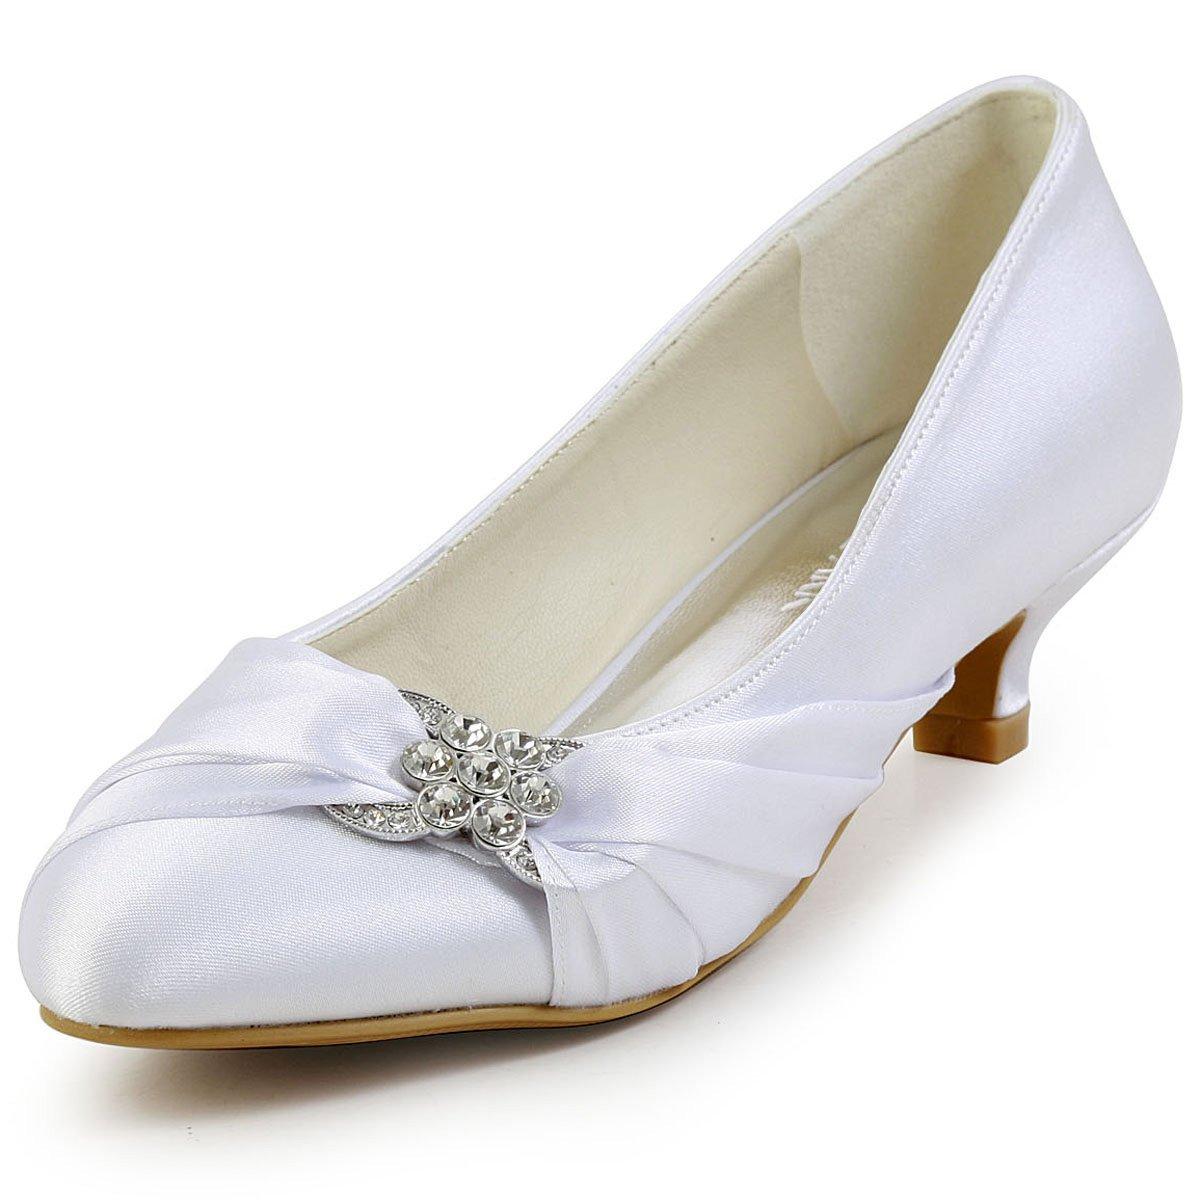 ElegantPark EP2006L Women Closed Toe Comfort Heel Rhinestone Satin Wedding Bridal Shoes White US 9